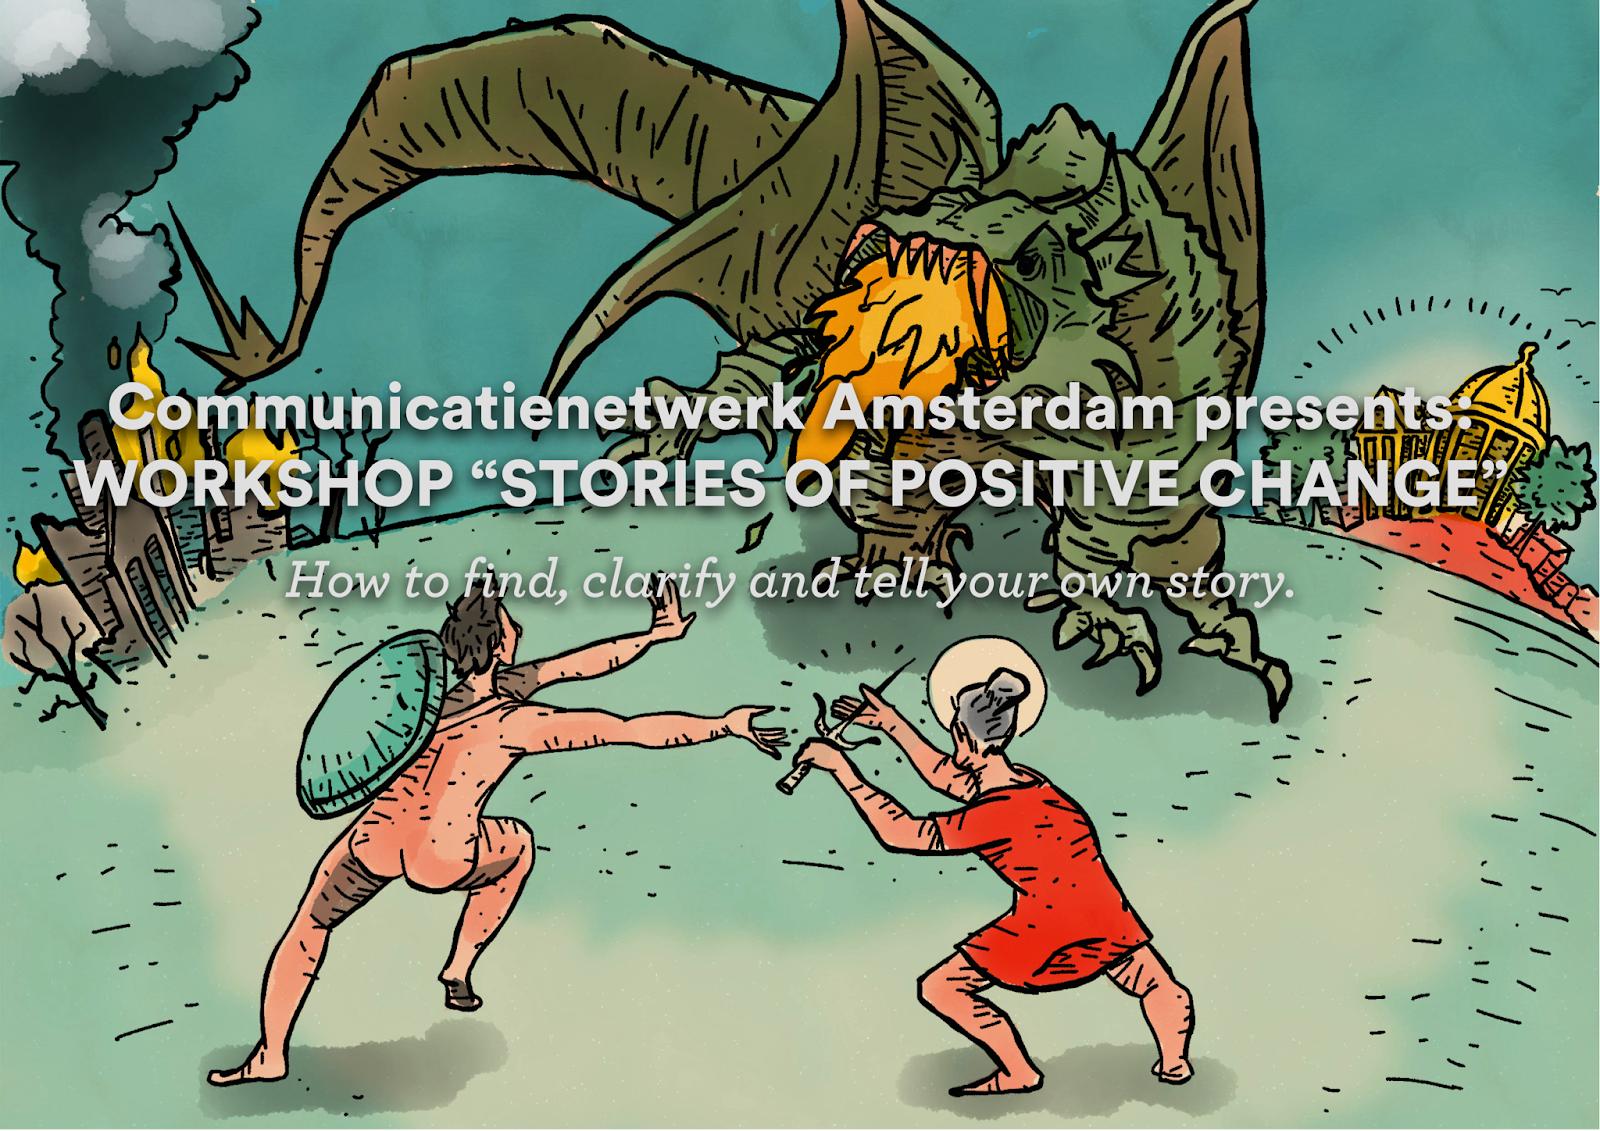 Storytelling workshop: STORIES OF POSITIVE CHANGE